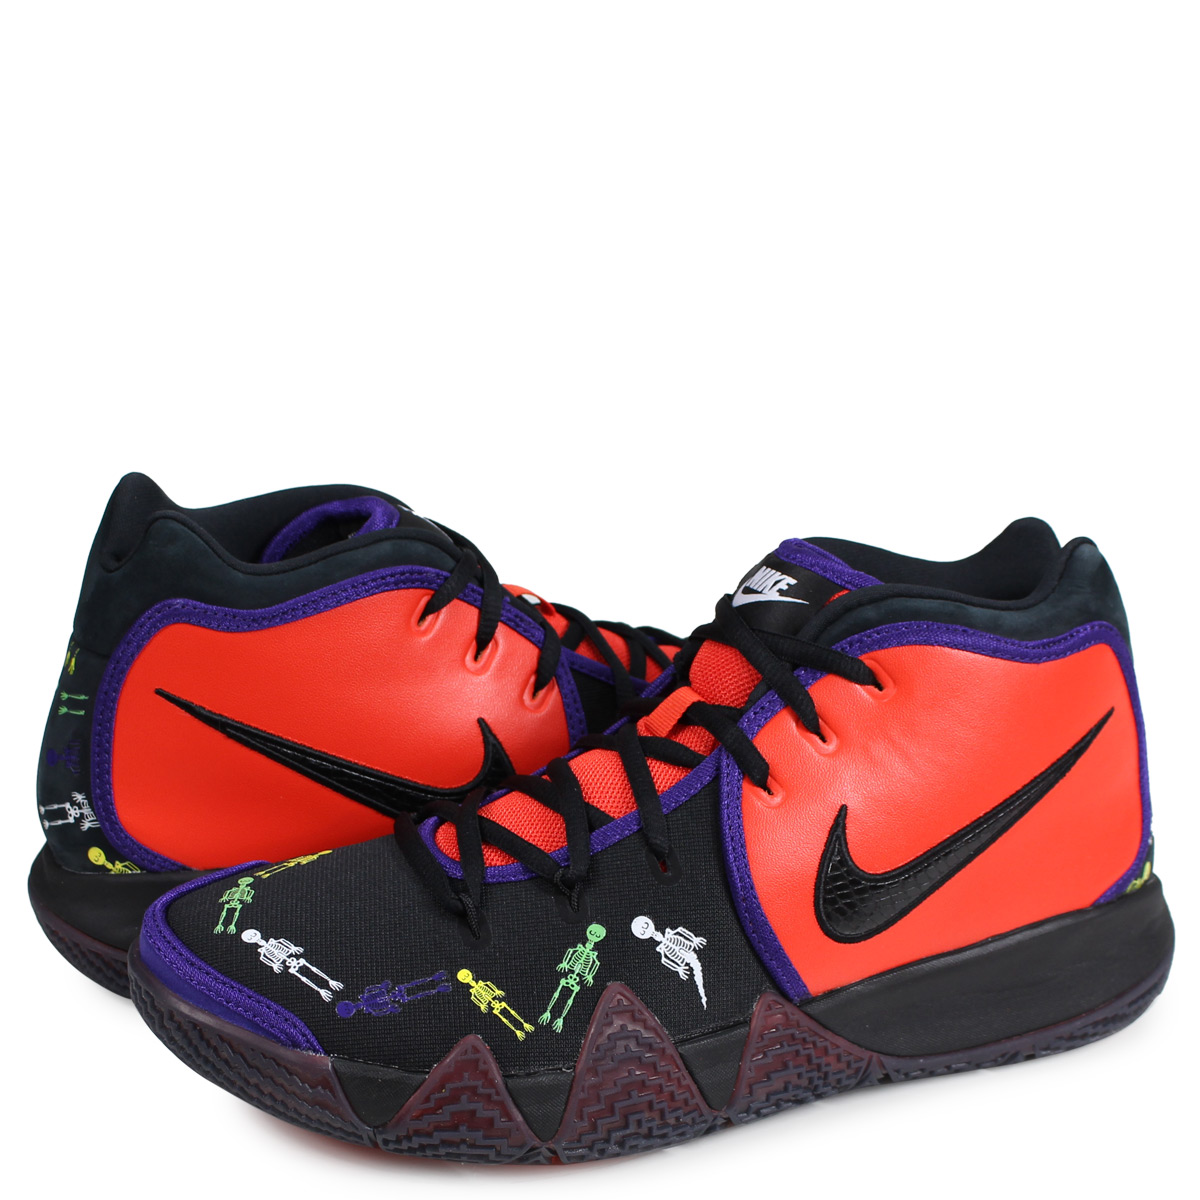 b99bc376985 ALLSPORTS  Nike NIKE chi Lee 4 sneakers men KYRIE 4 DOTD TV PE 1 black  CI0278-800  1812